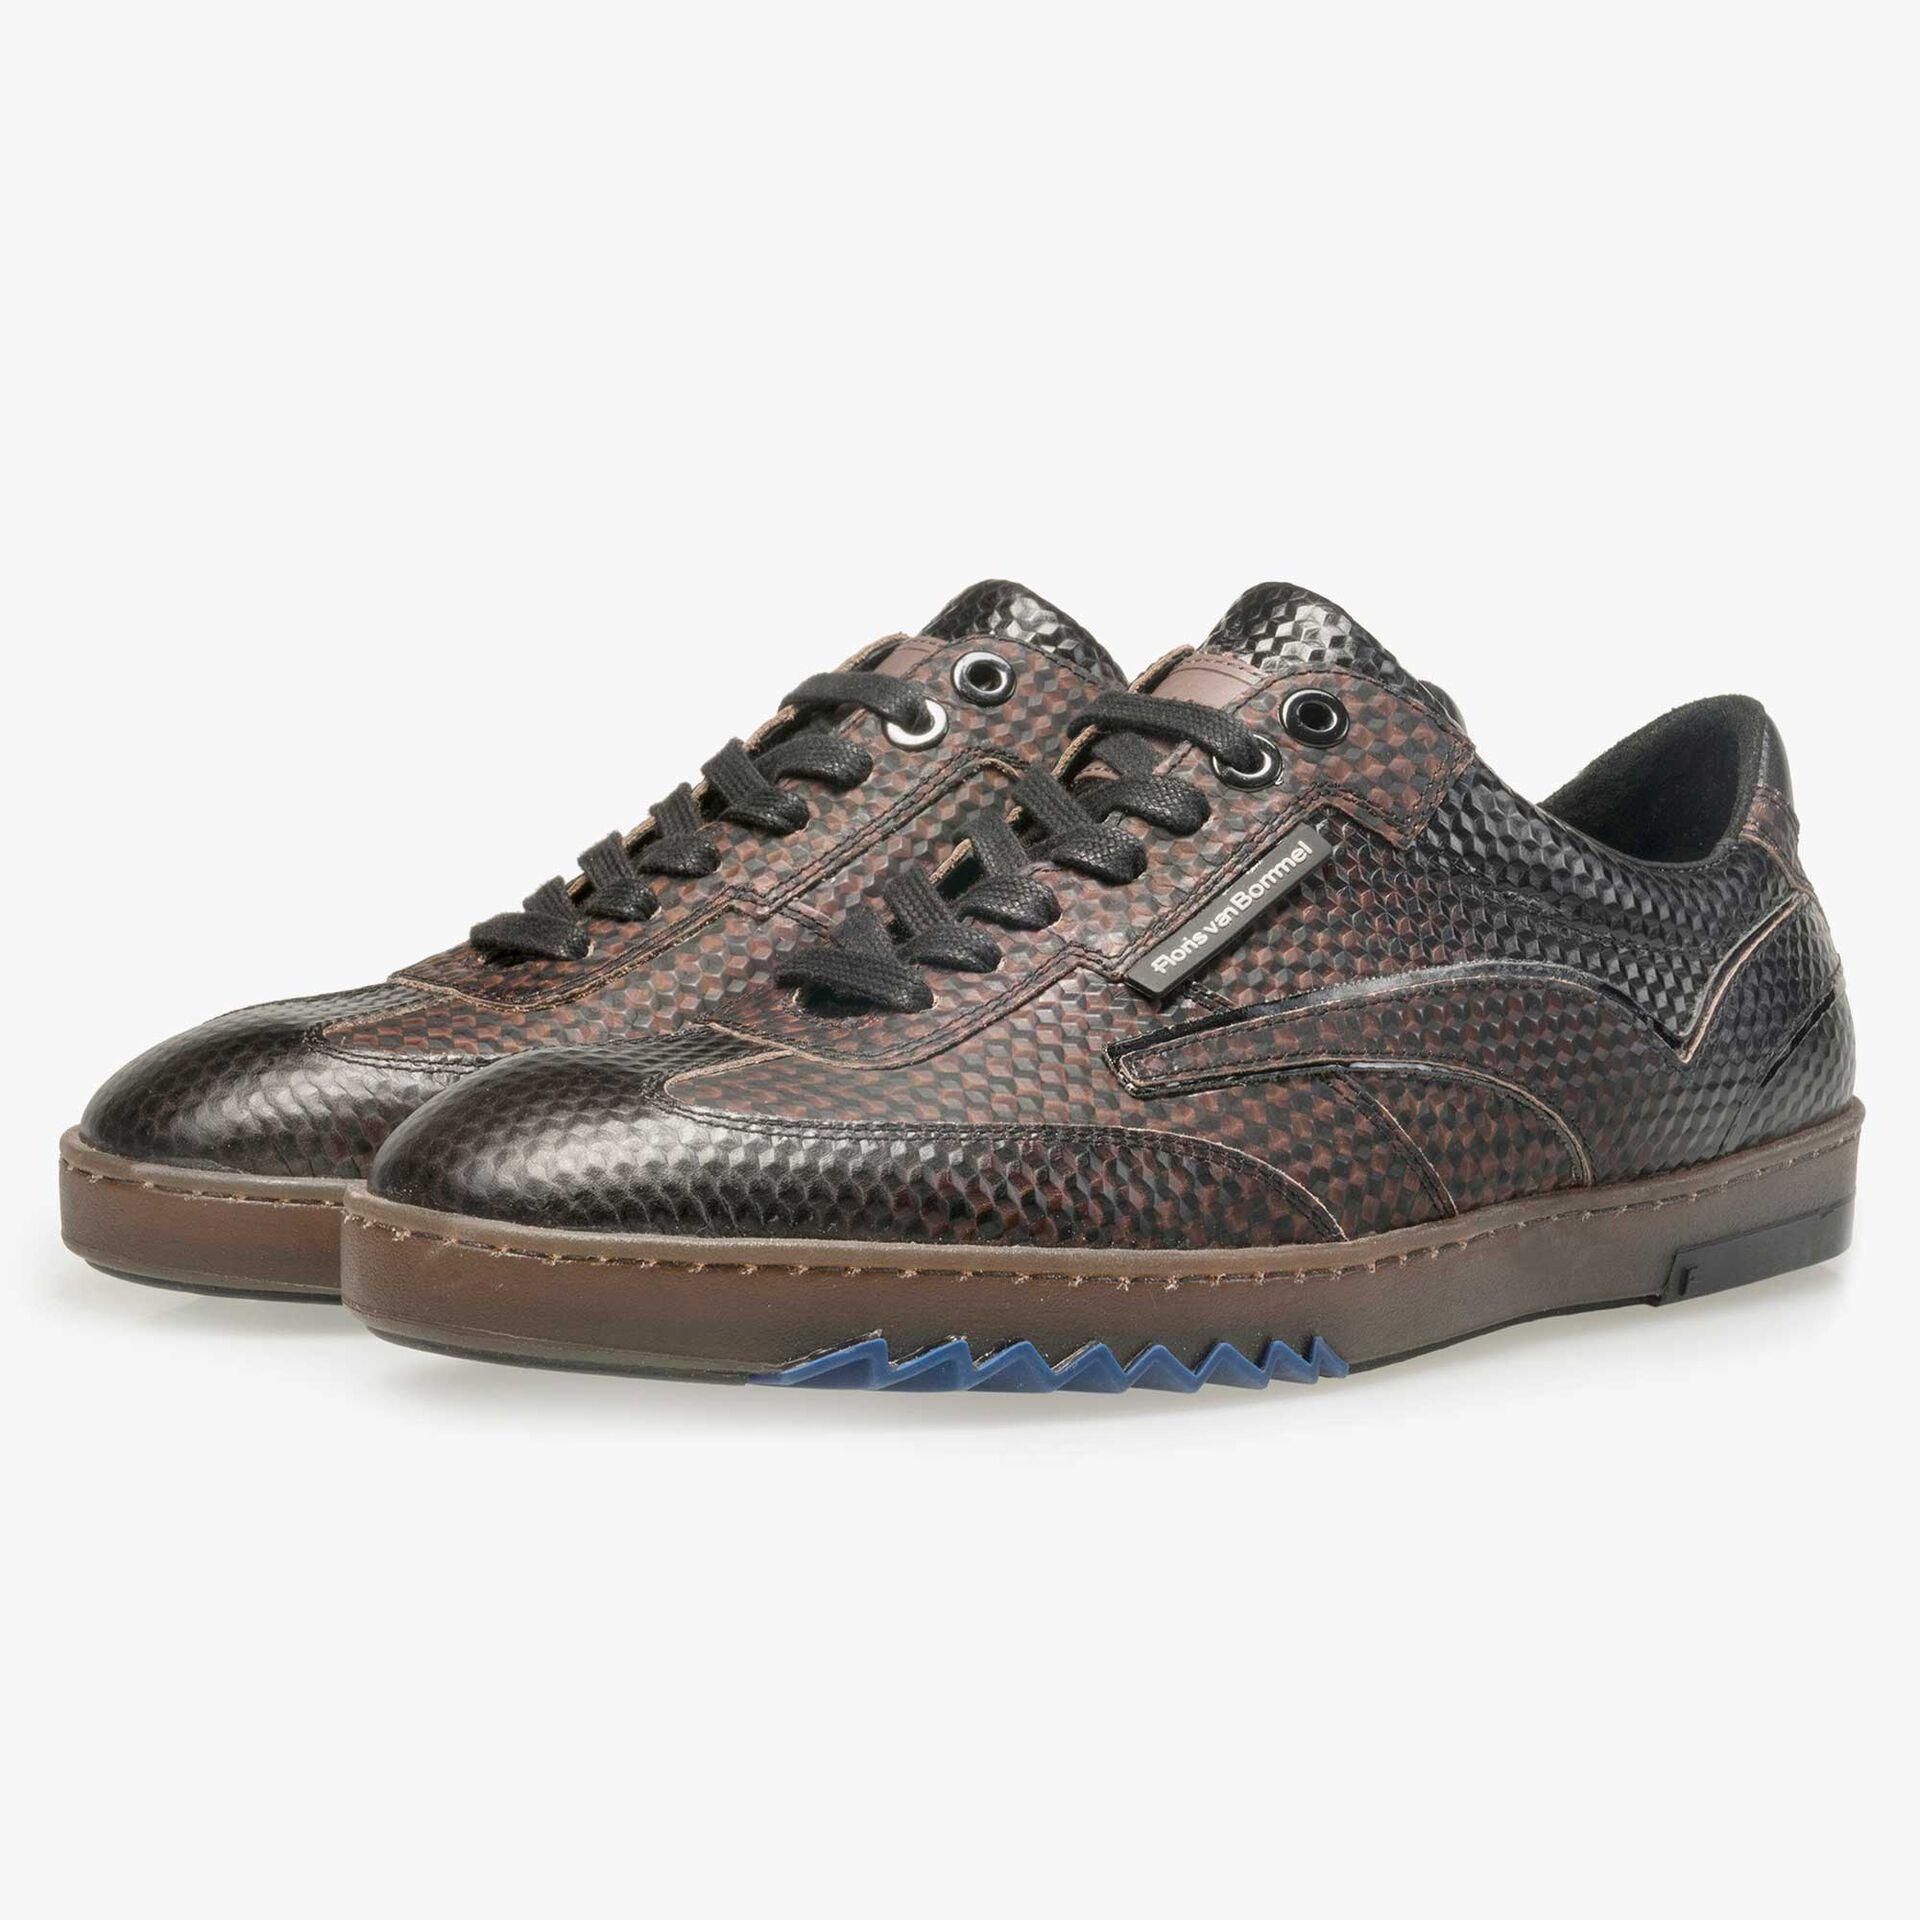 Floris van Bommel men's dark brown sneaker finished with a black print